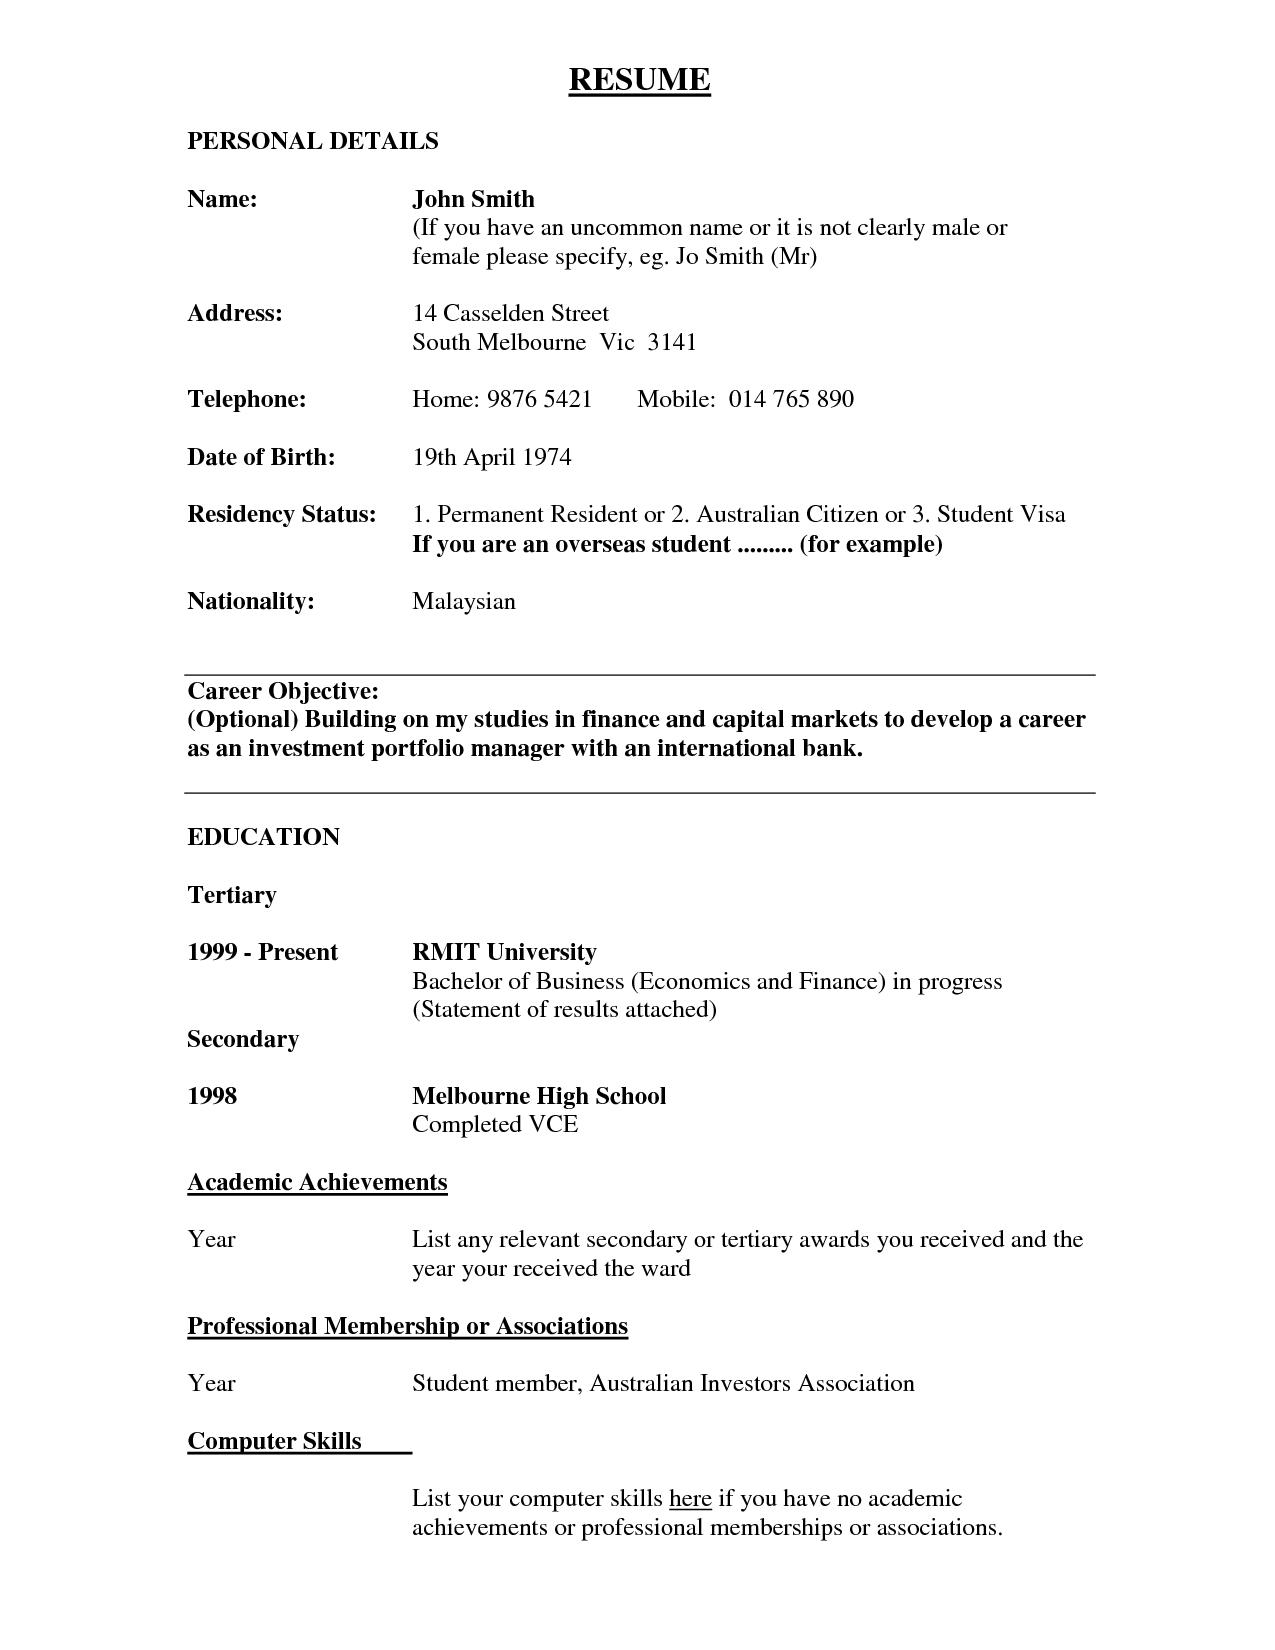 Best Resume Format For Banking Job Nalamnow